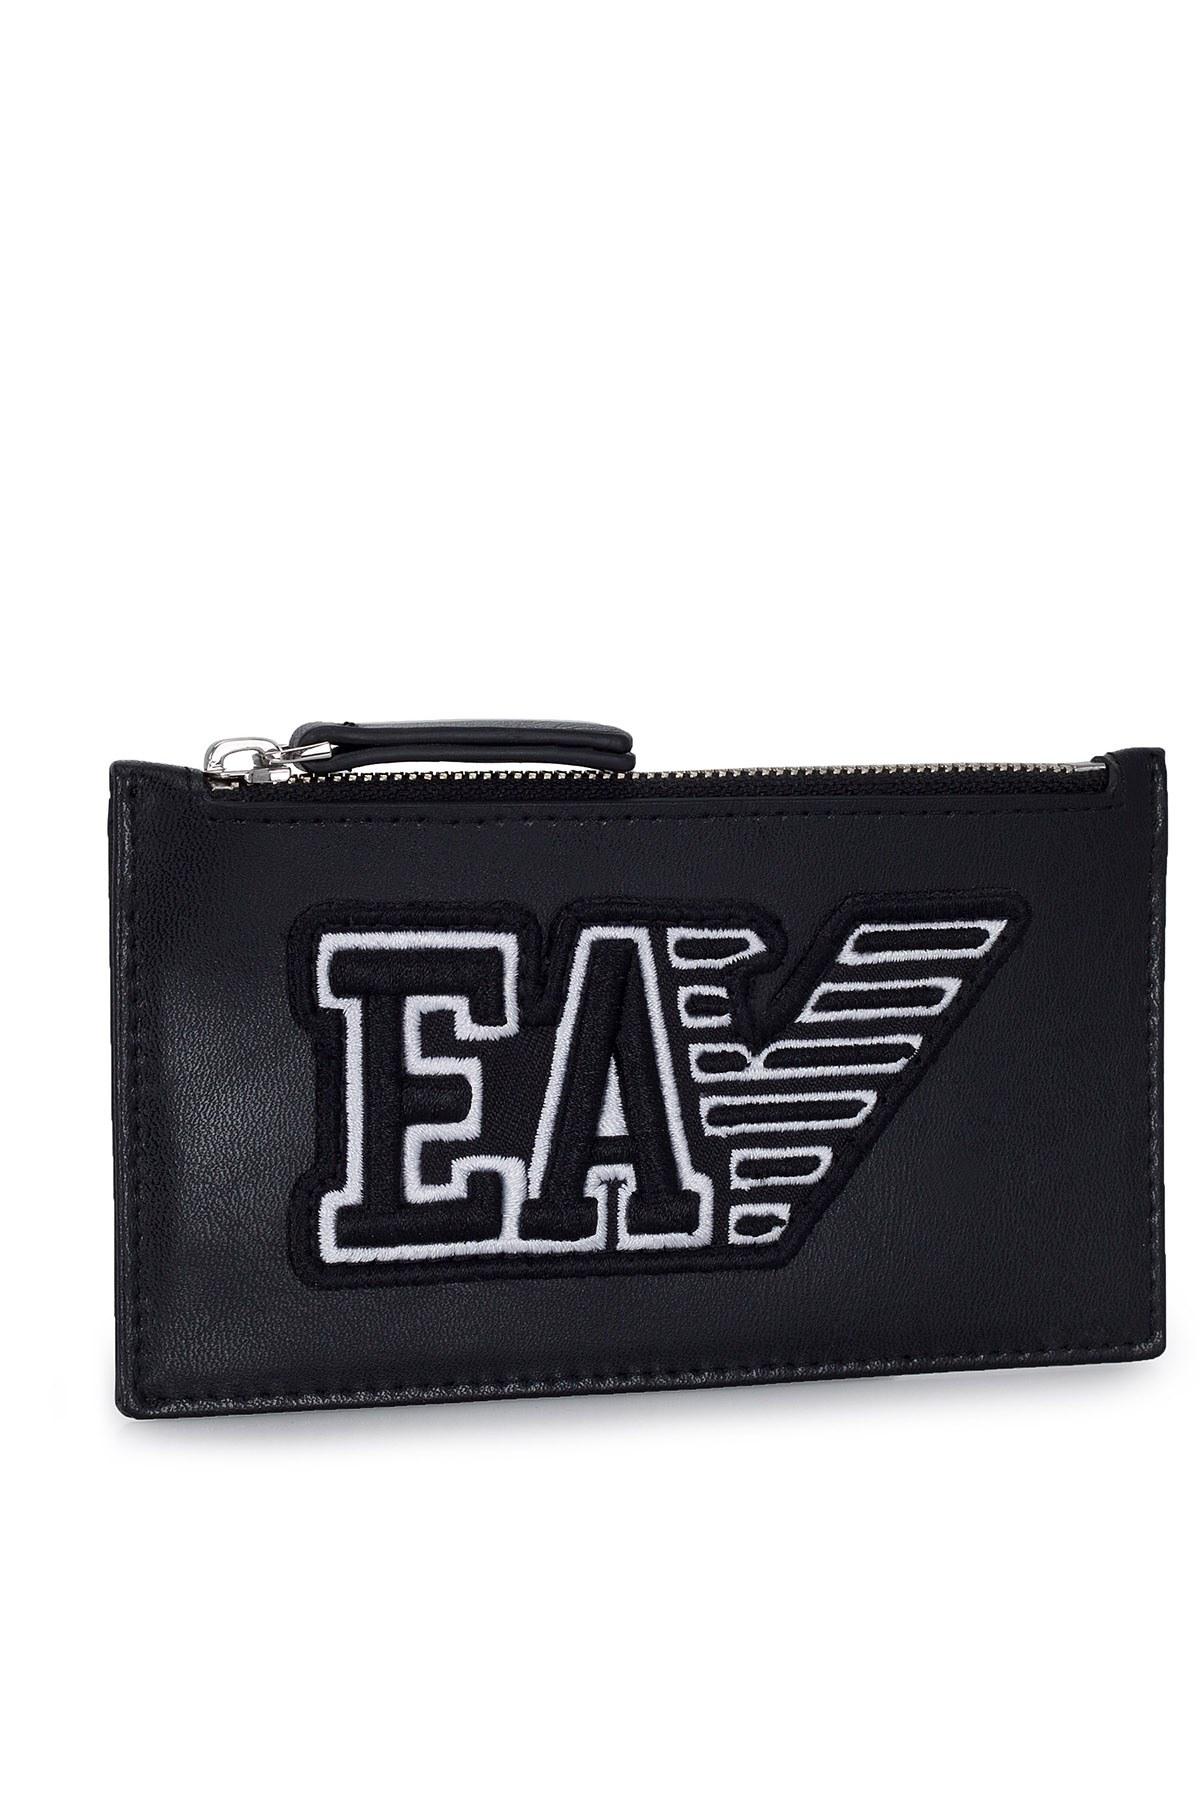 Emporio Armani Logo Baskılı Erkek Kartlık Y4R179 YTC2E 81072 SİYAH